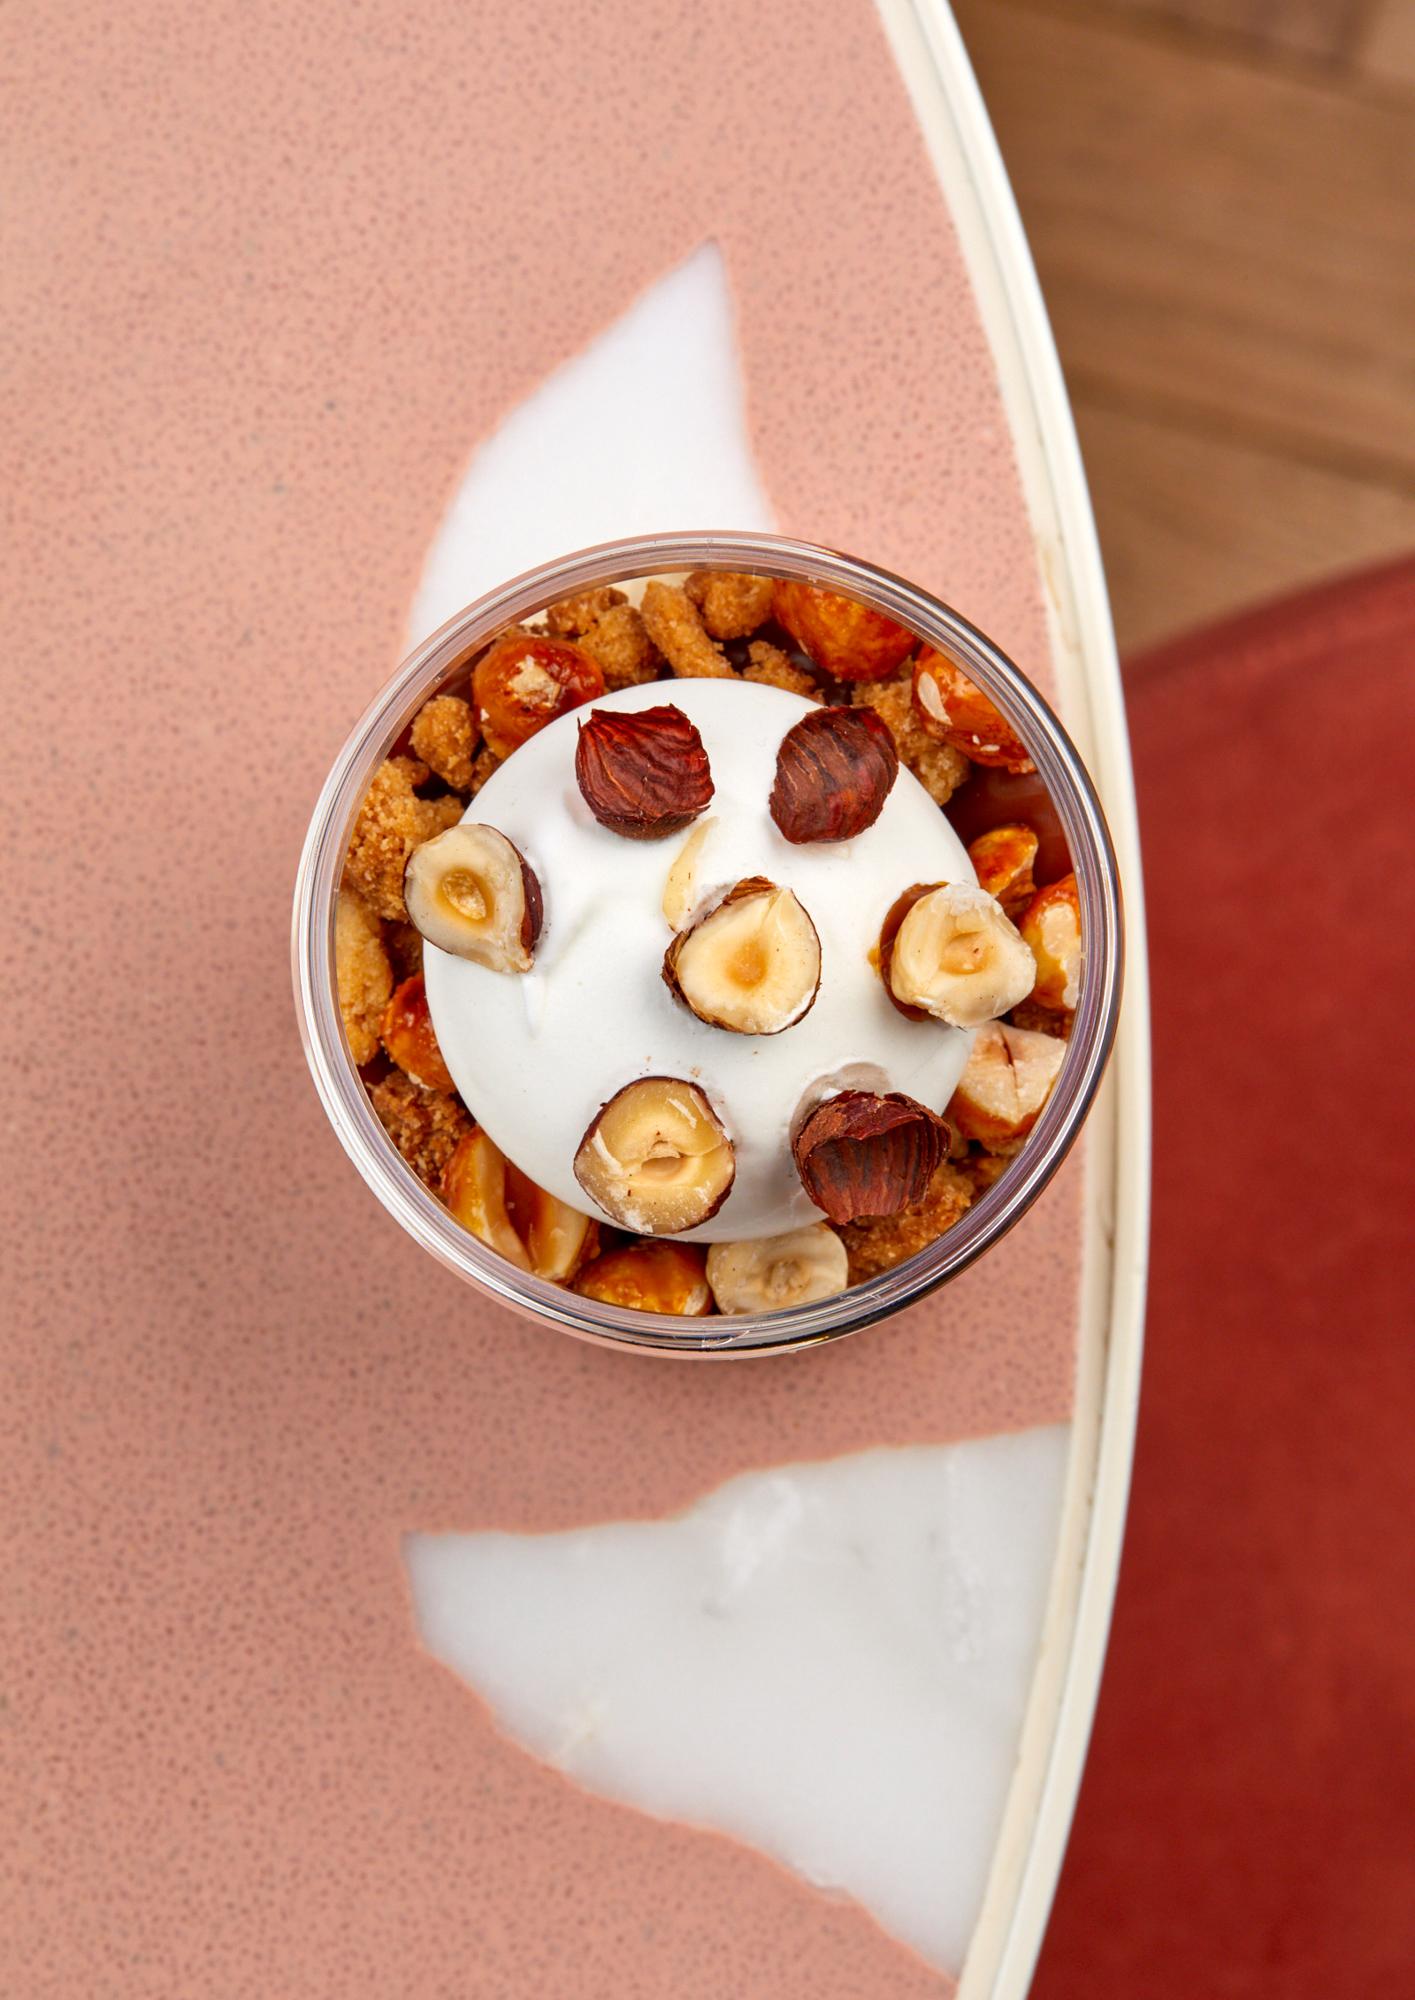 An irresistible Bafarat ice cream jar with vanilla, salted caramel and hazelnut